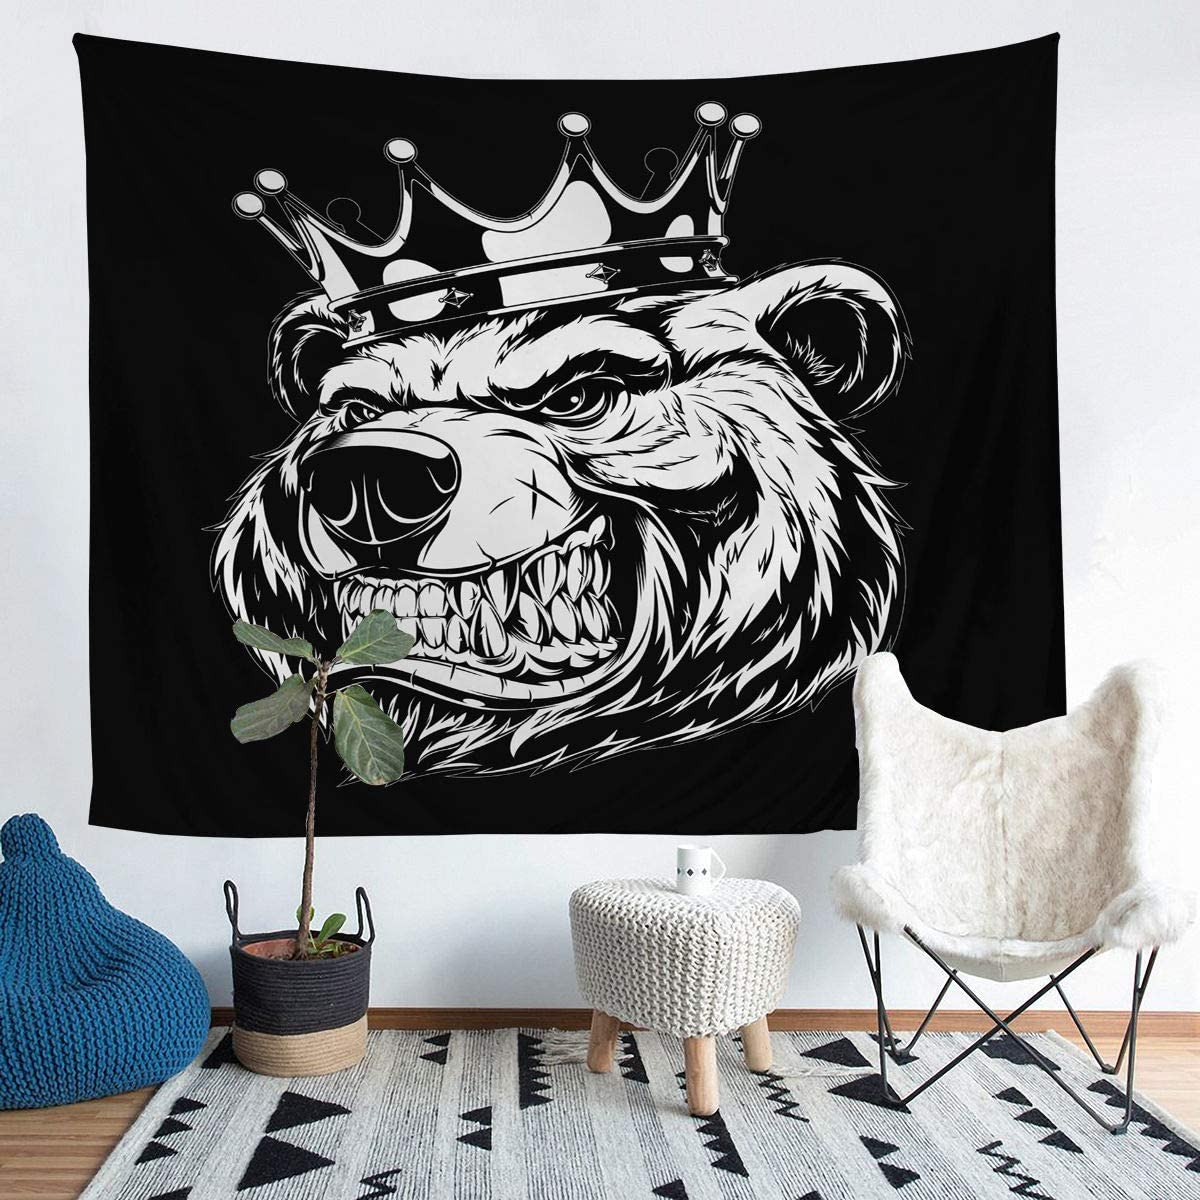 Erosebridal Men Bear Tapestries Ferocious Bear Head Wall Hangings Crown Pattern Bedding Throw Blanket Wildlife Animal Print Tapestry, Wall Art Decor Window Curtain